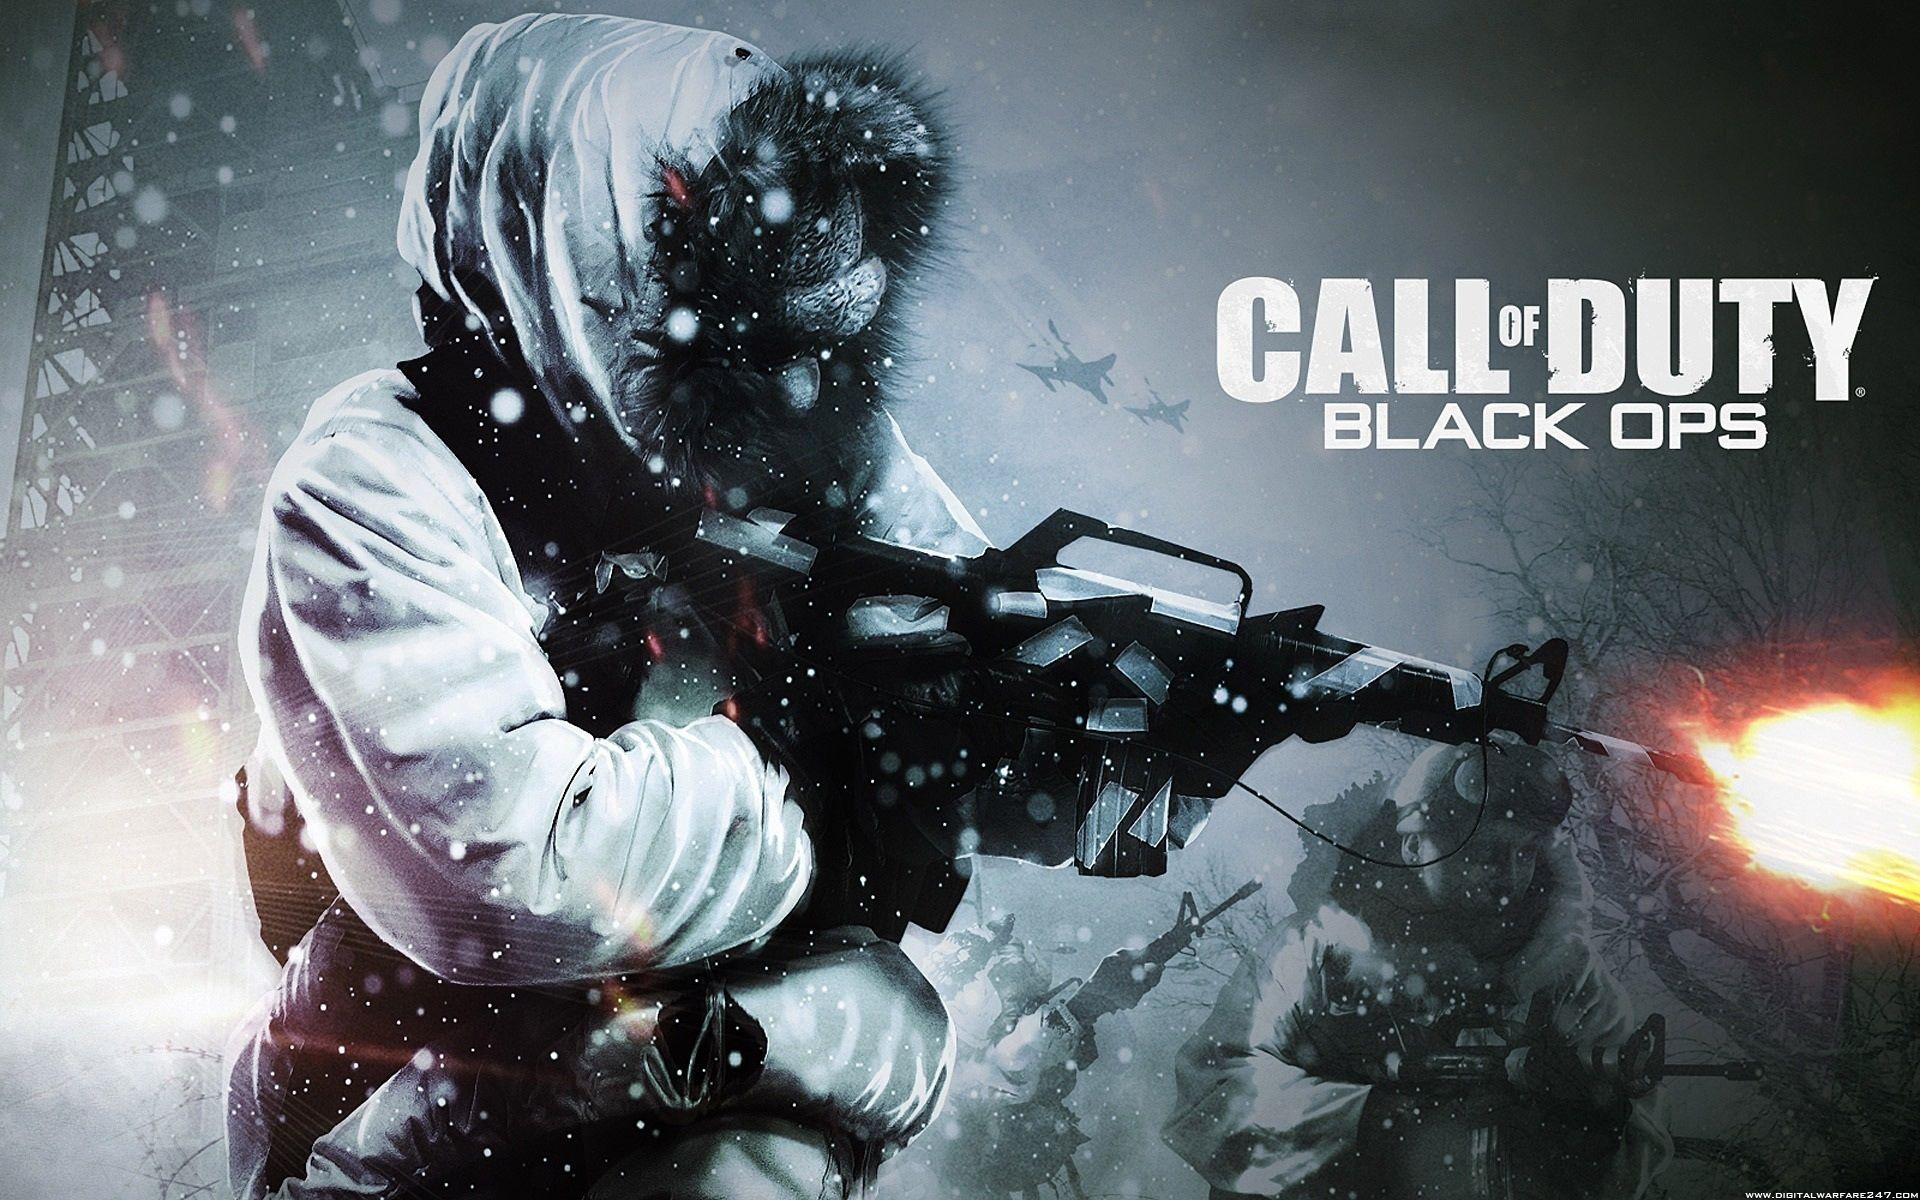 Batman Joker Full Hd Wallpaper Call Of Duty Black Ops Hd Wallpaper Background Image